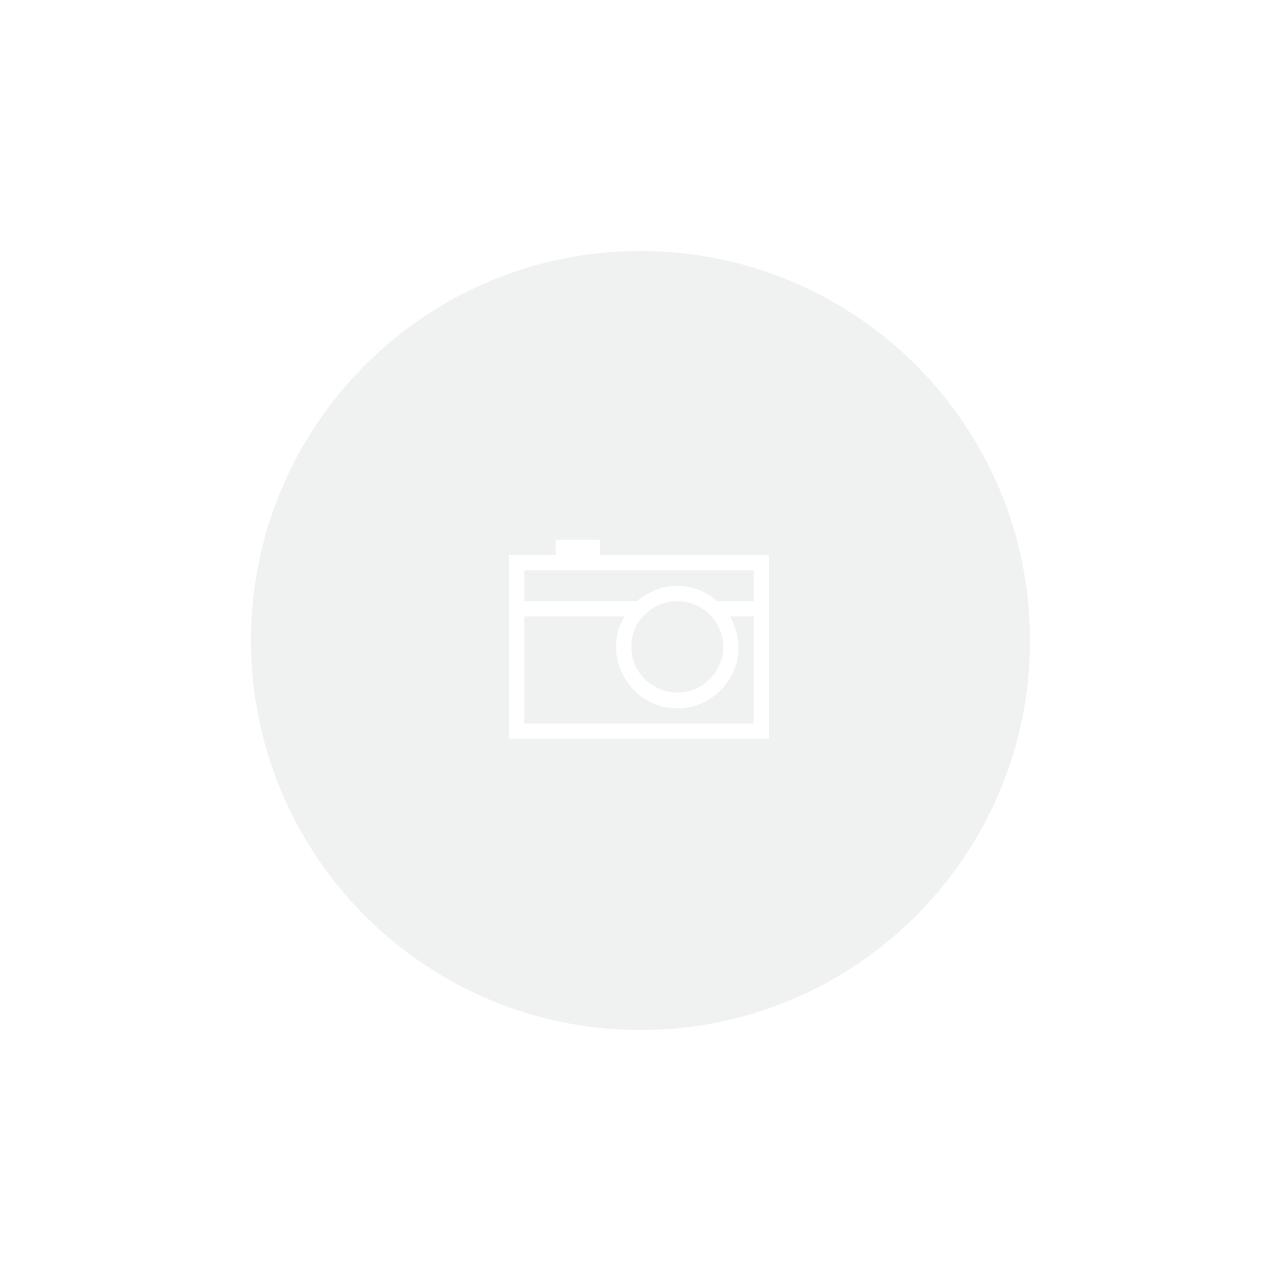 REFLETOR HOLOFOTE MICROLED 30W IP66 BRANCO FRIO